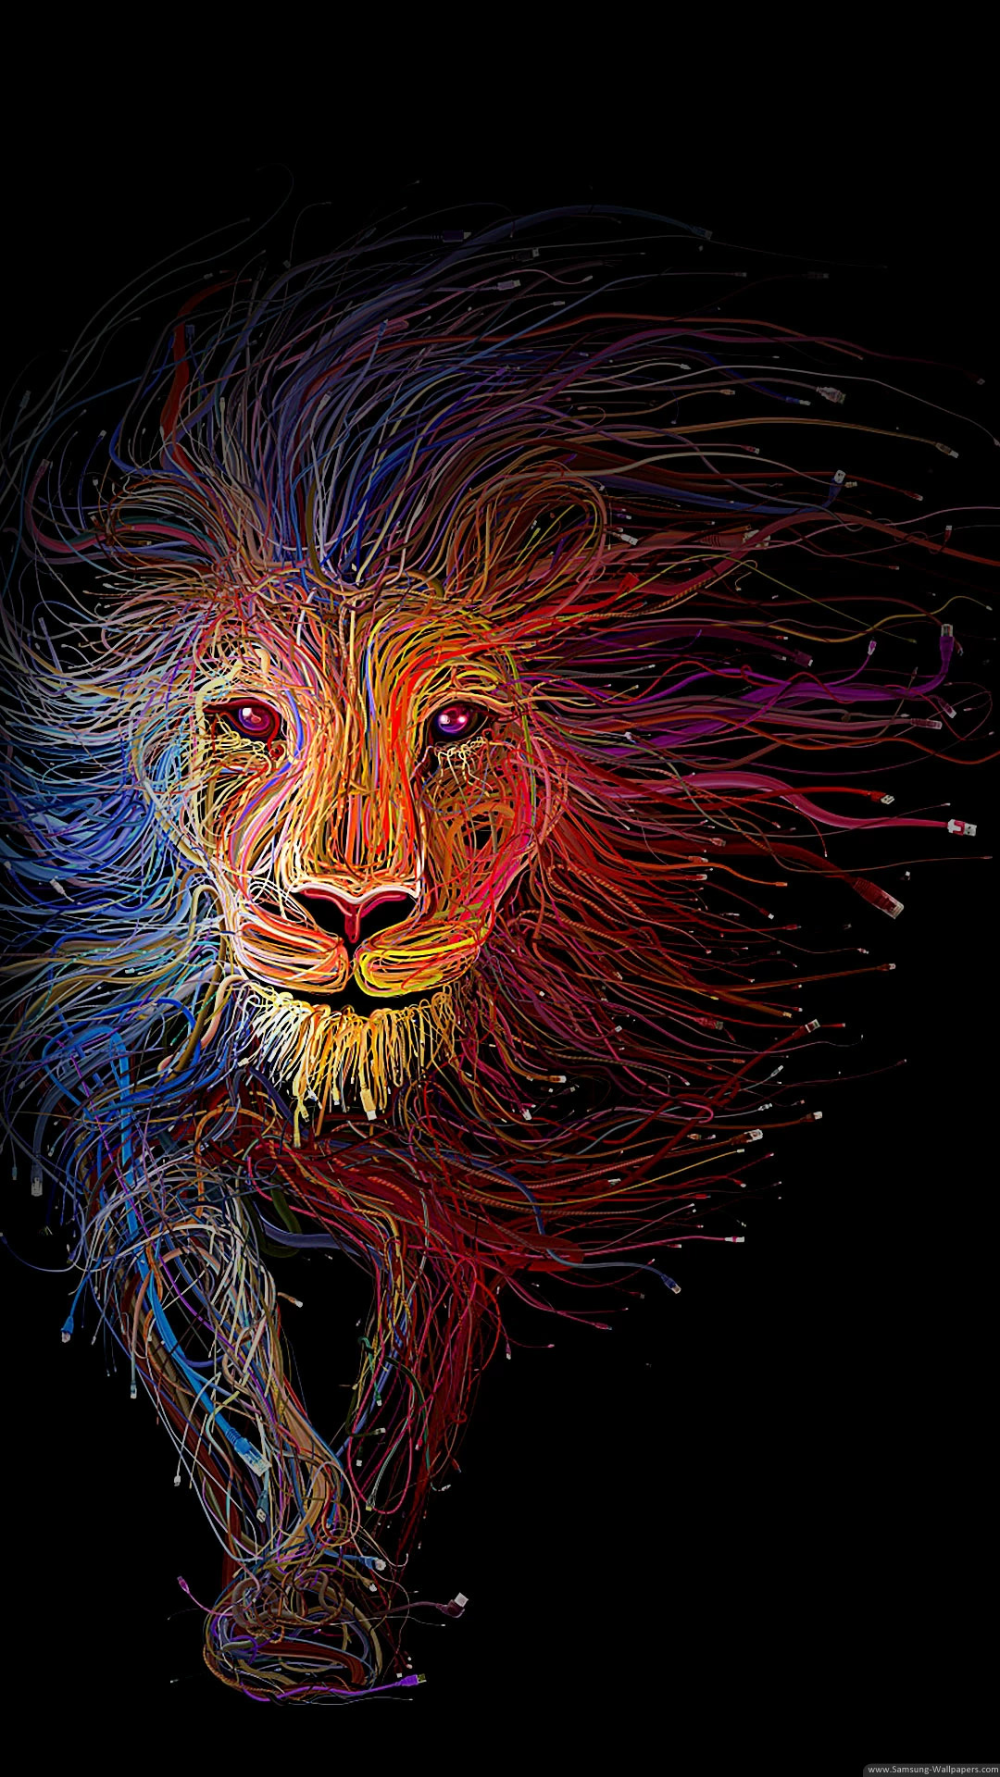 Fantasy Lion Stock 1080x1920 Samsung Galaxy S6 Wallpaper Hd Samsung Wallpapers Lion Wallpaper Iphone Abstract Lion Lion Wallpaper